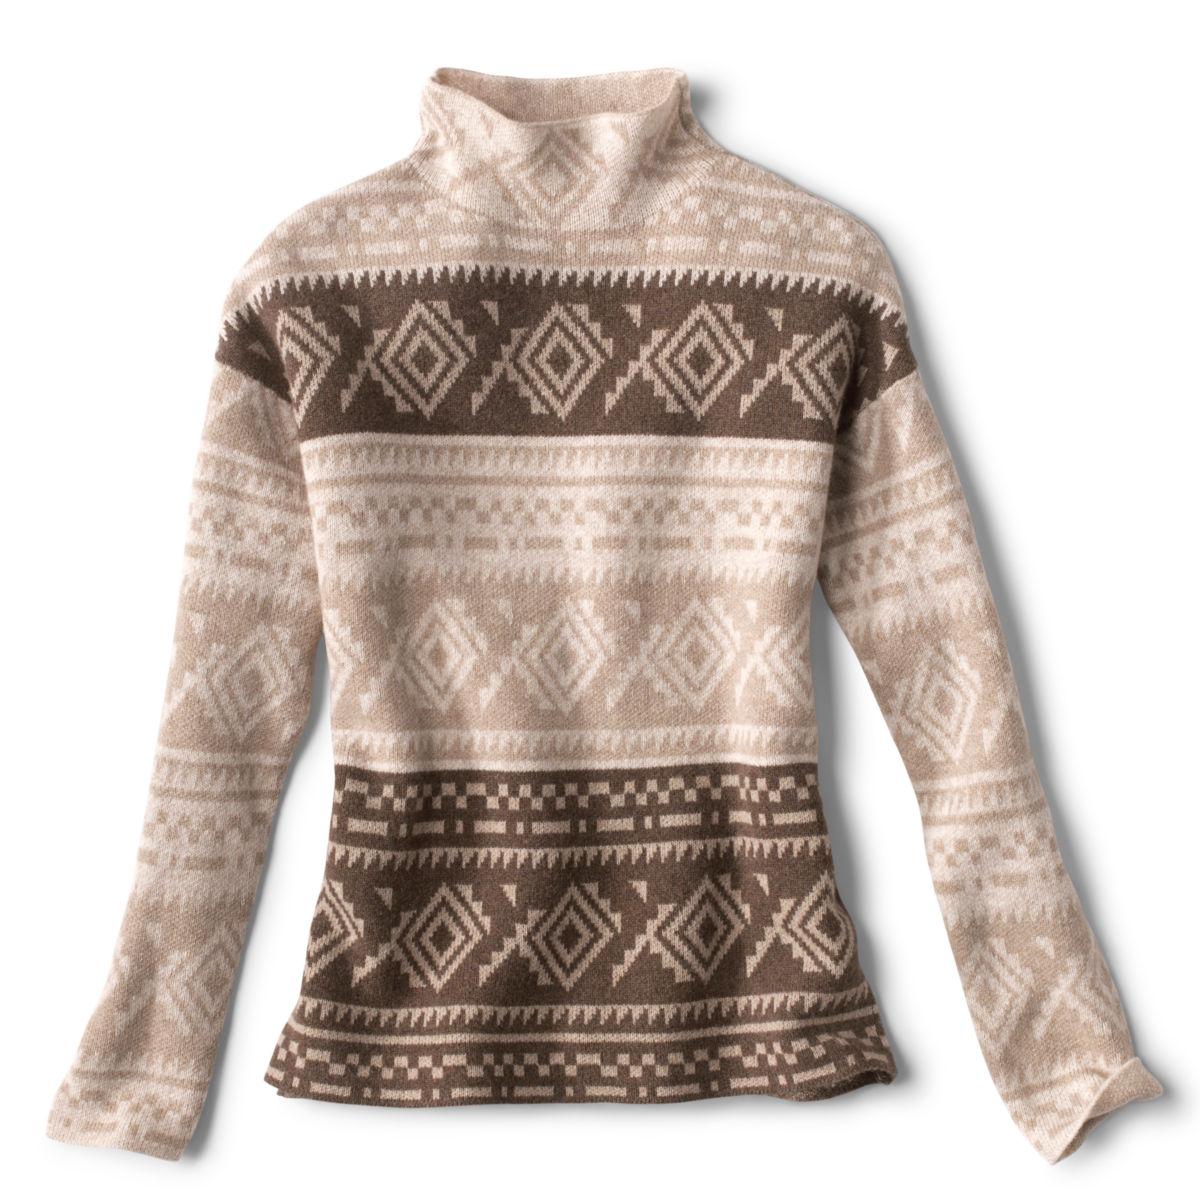 Natural Fair Isle Dolman Sweater - NATURALimage number 0